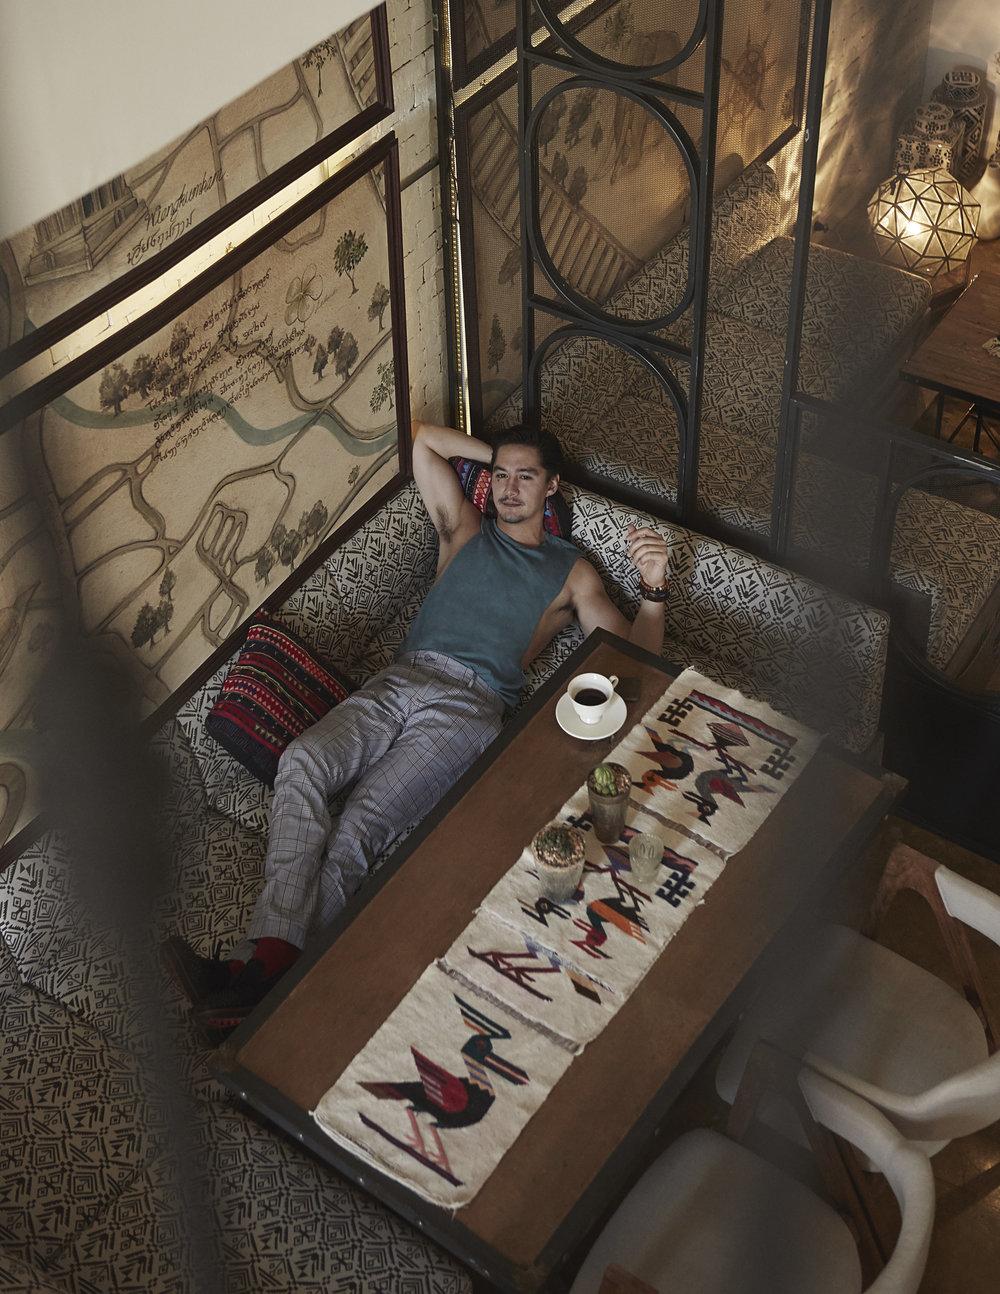 pants : Hackett London / shoes : christian Louboutin